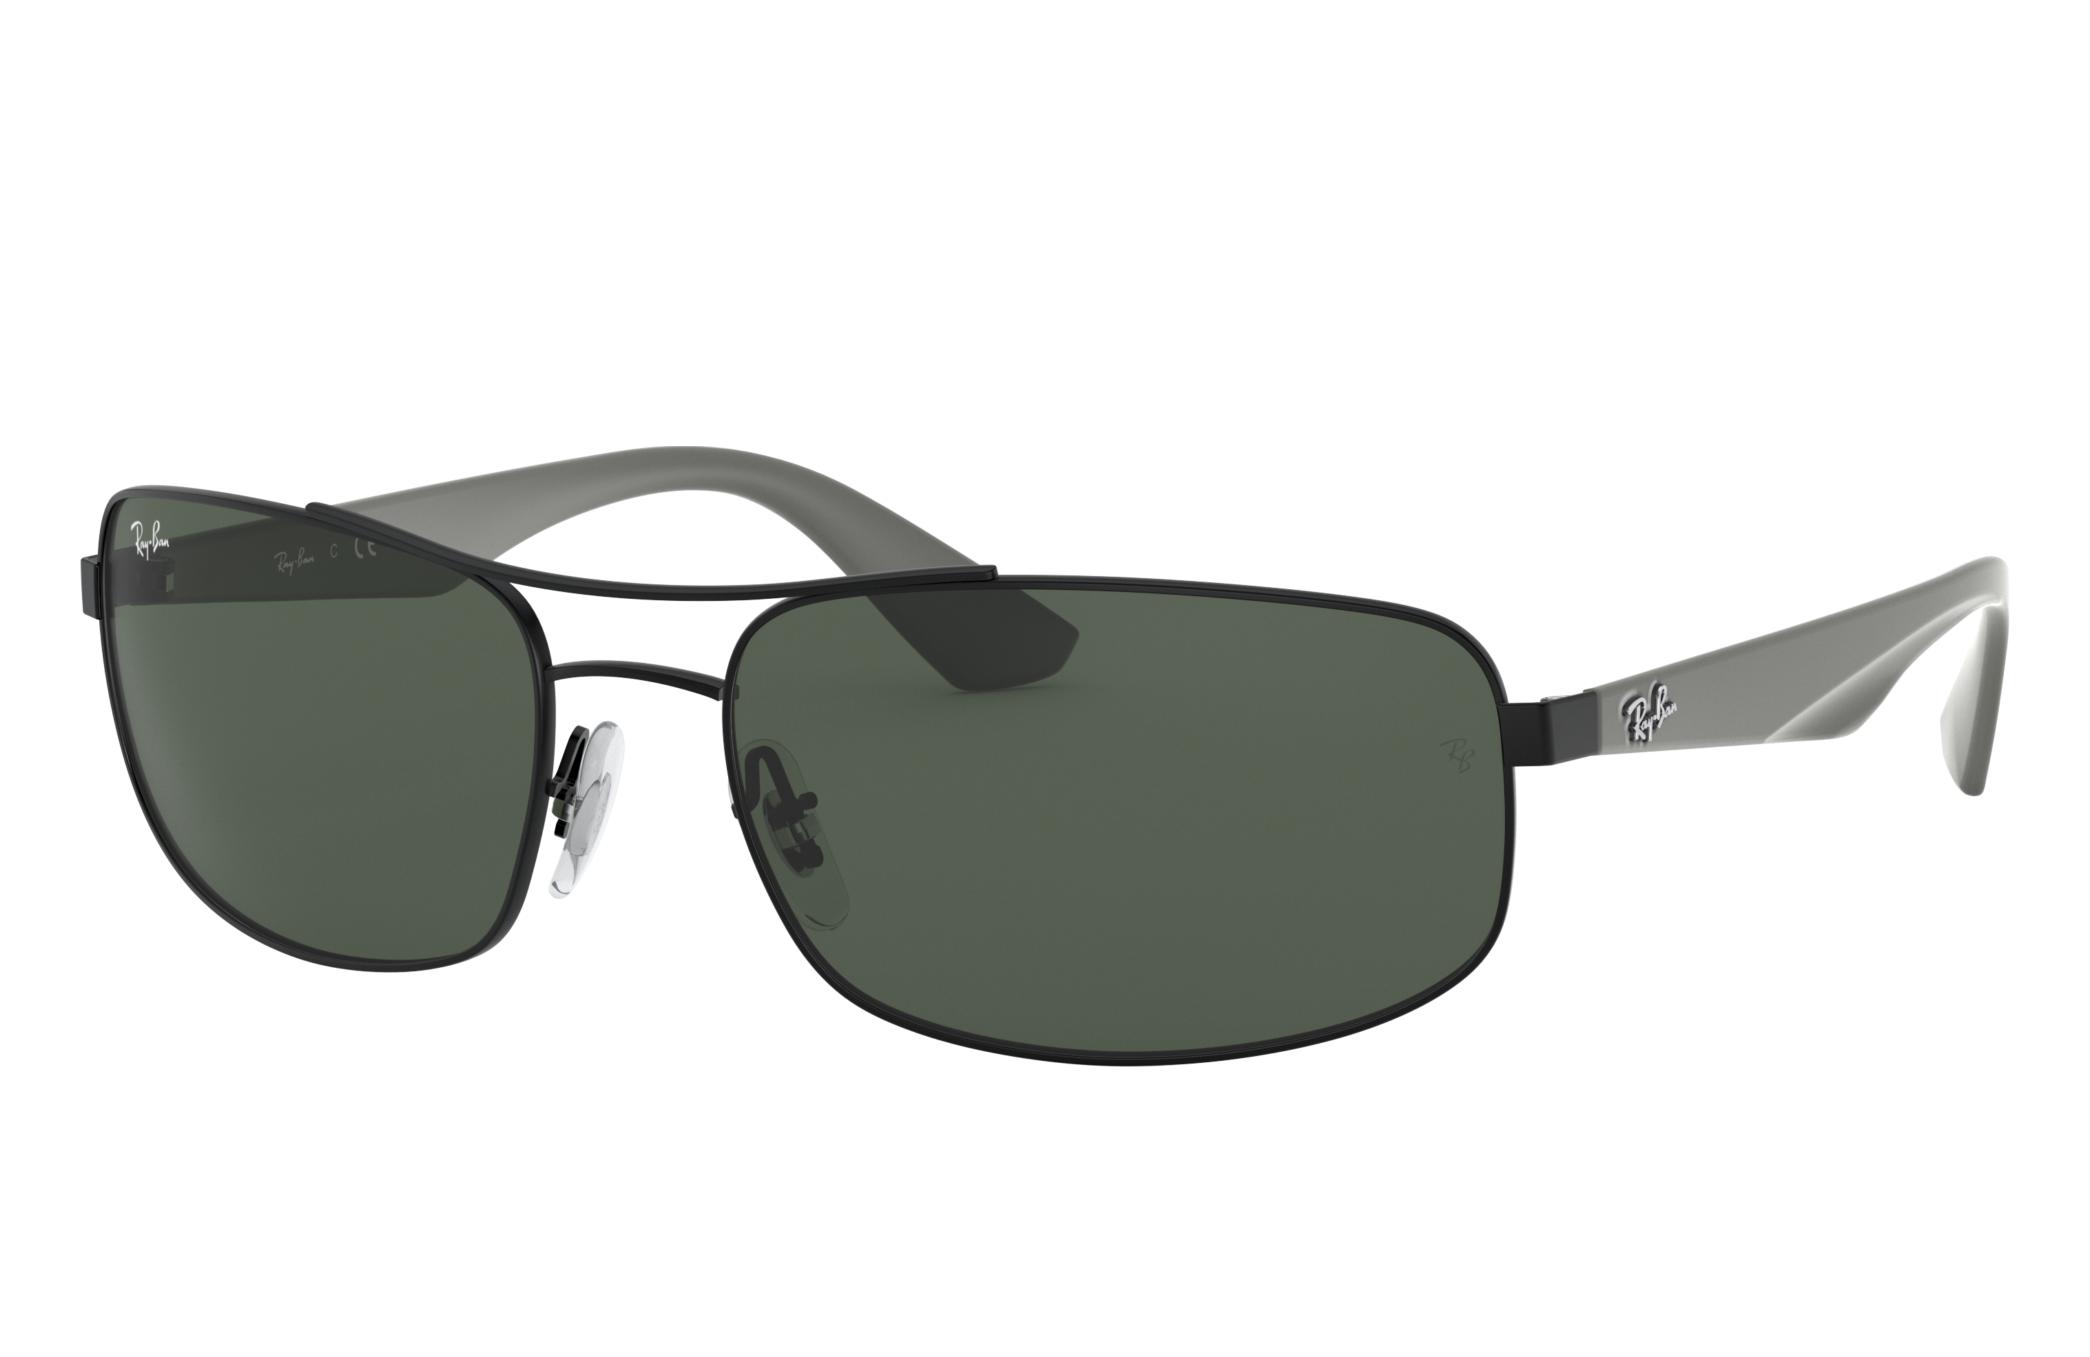 Ray-Ban Rb3527 Grey, Green Lenses - RB3527